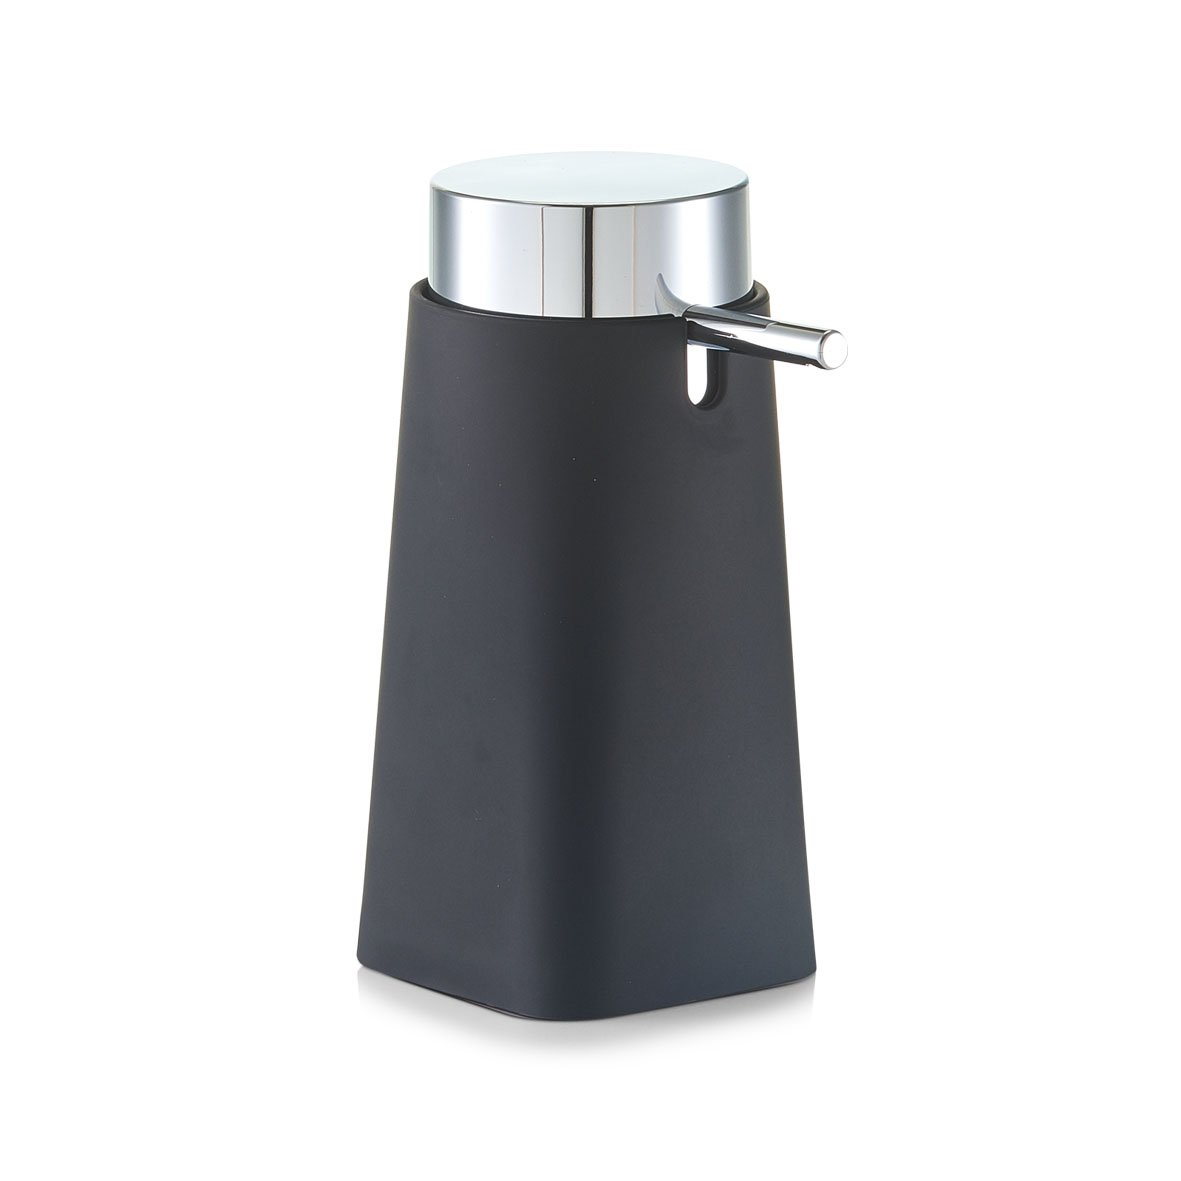 Zeller 18753/ Argento /Dispenser per sapone Glitter 10.3/x 10.3/x 14.5/cm Gres